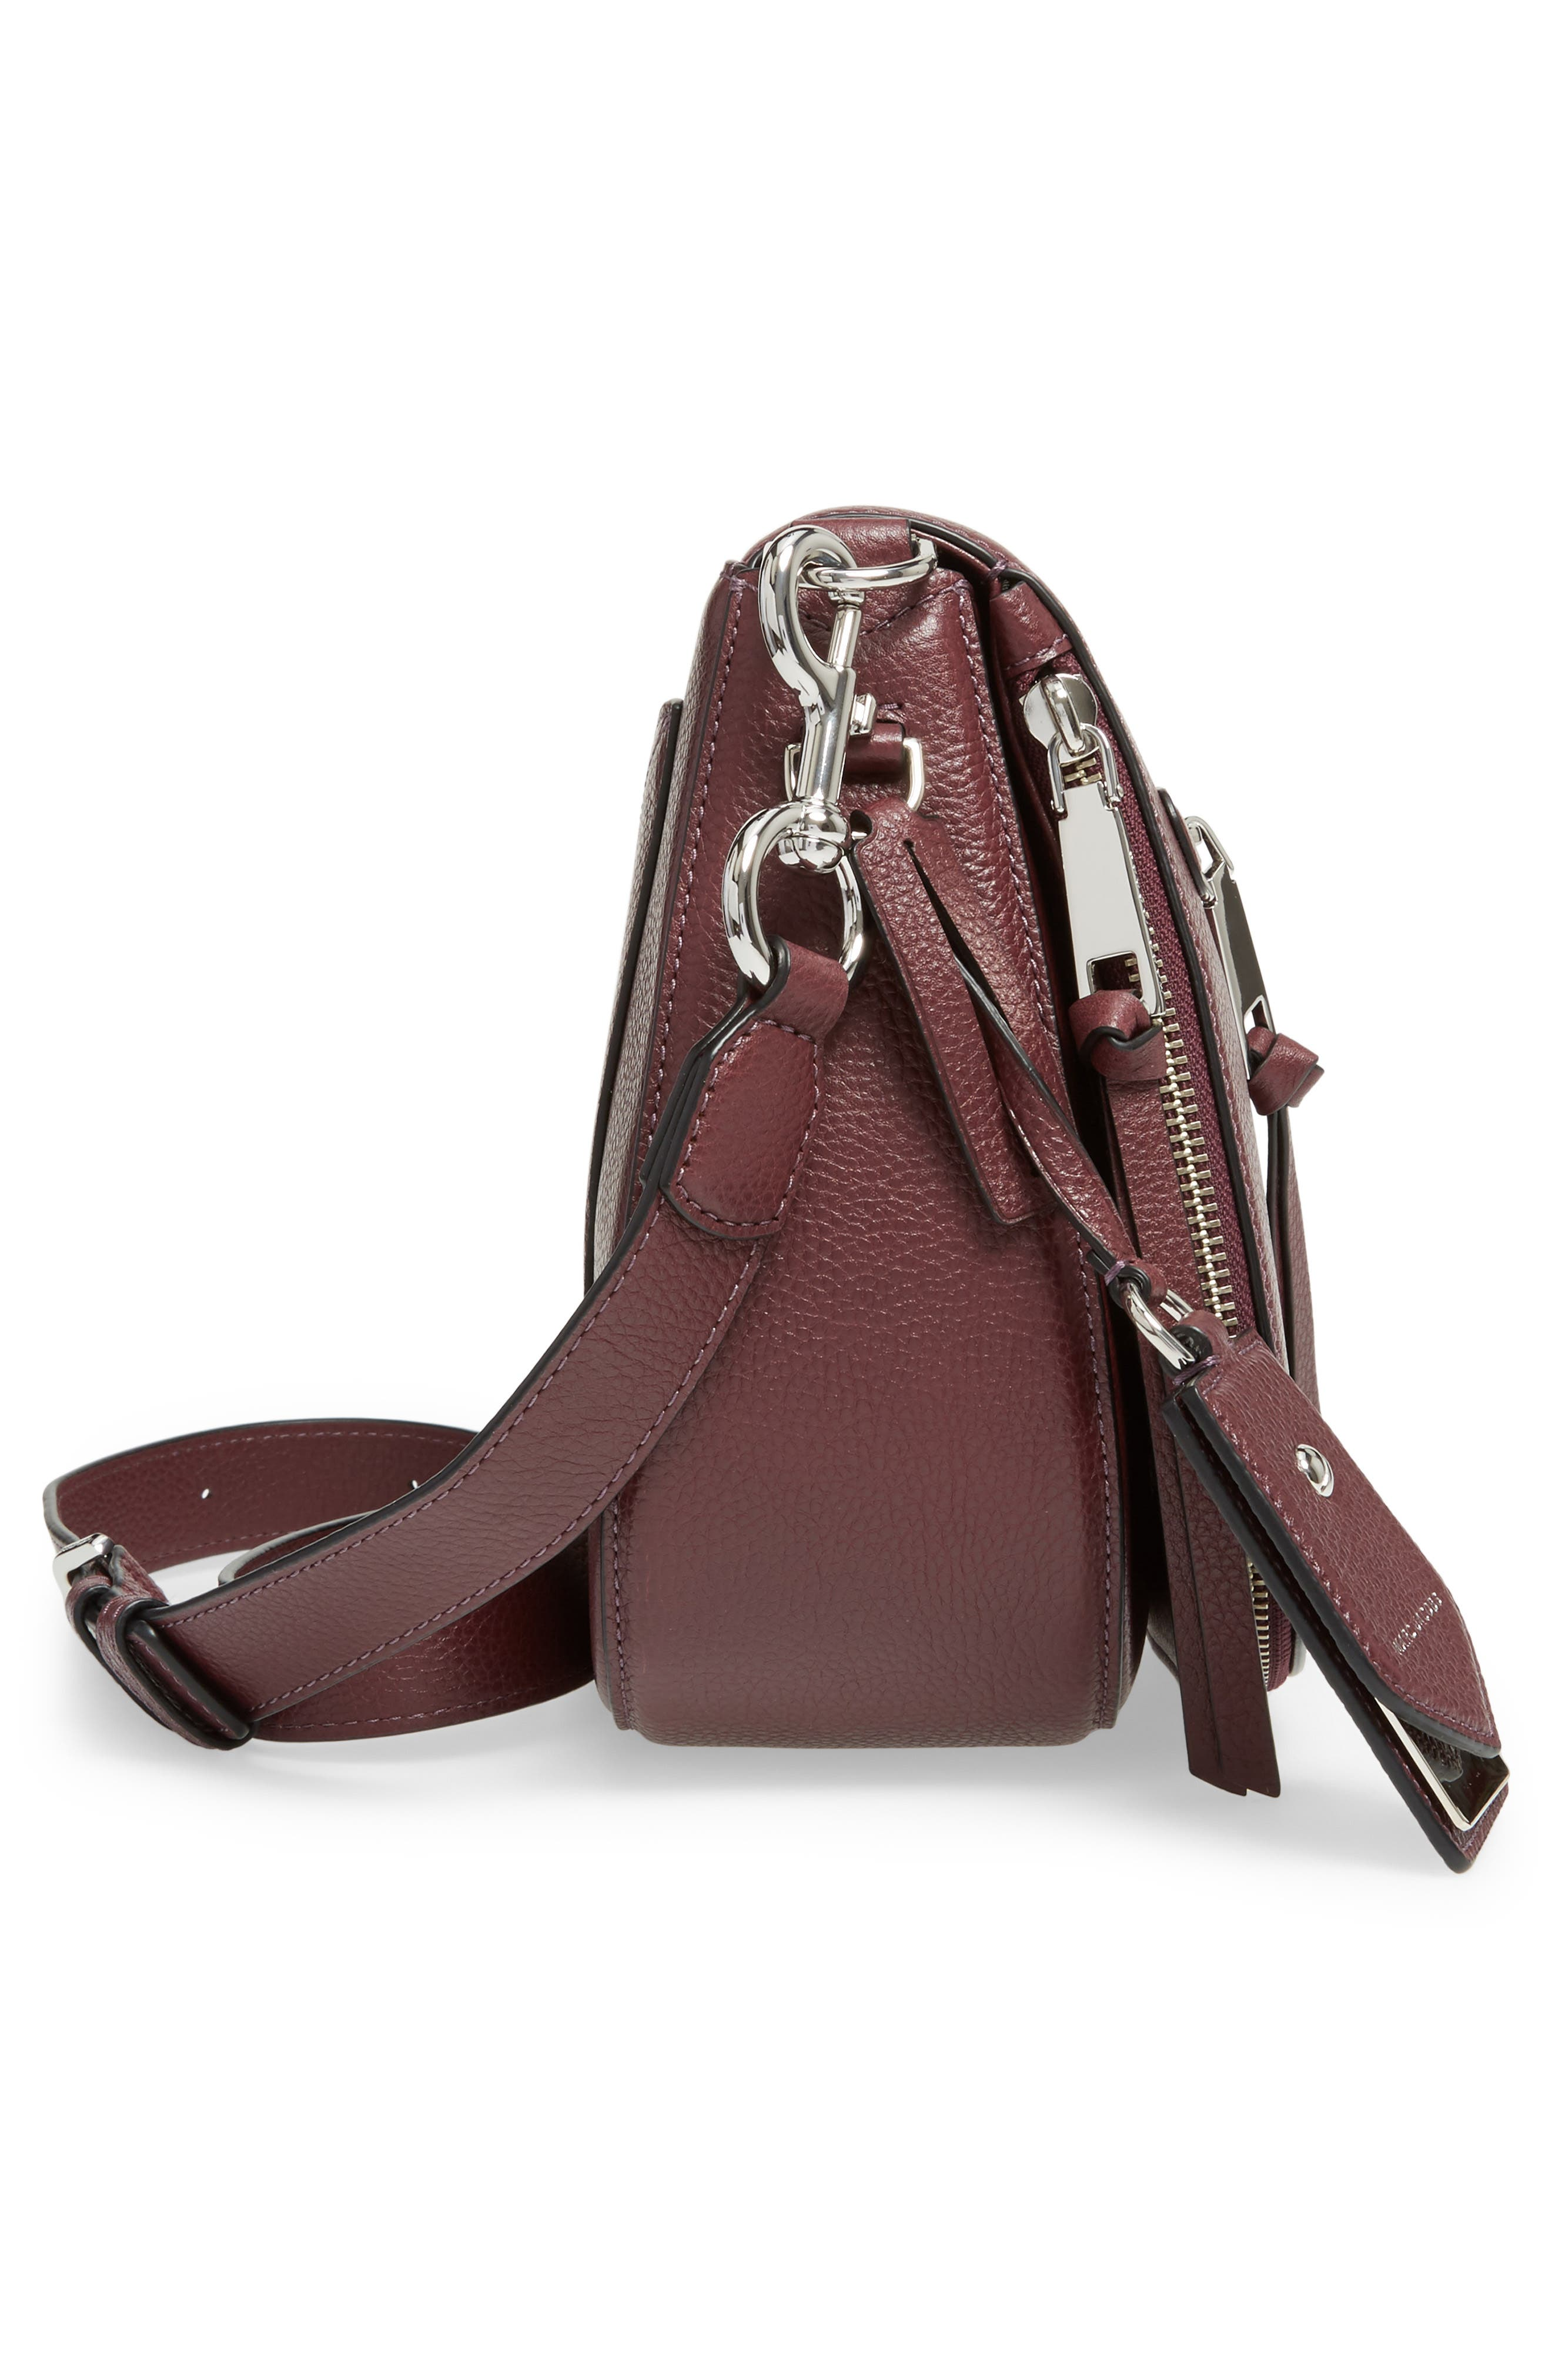 Recruit Nomad Pebbled Leather Crossbody Bag,                             Alternate thumbnail 5, color,                             538